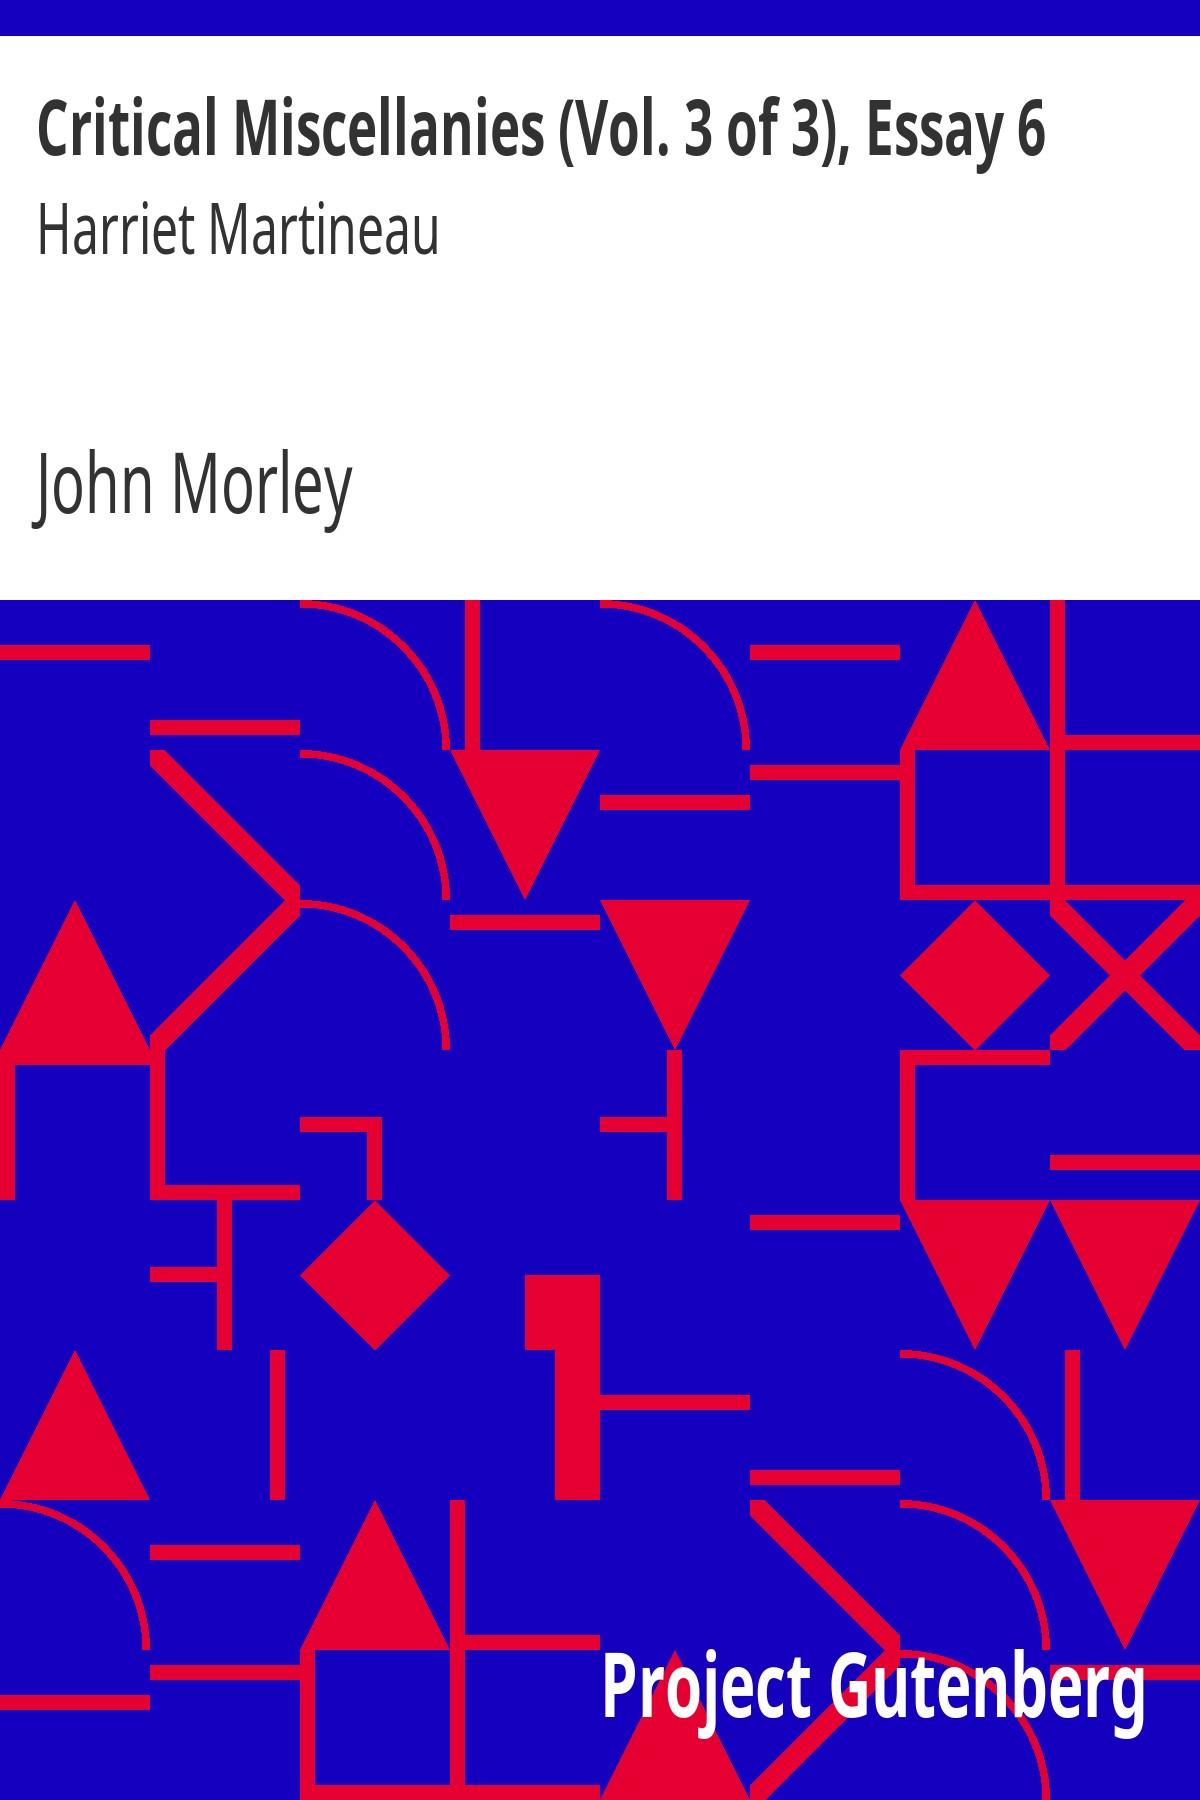 John Morley Critical Miscellanies (Vol. 3 of 3), Essay 6: Harriet Martineau